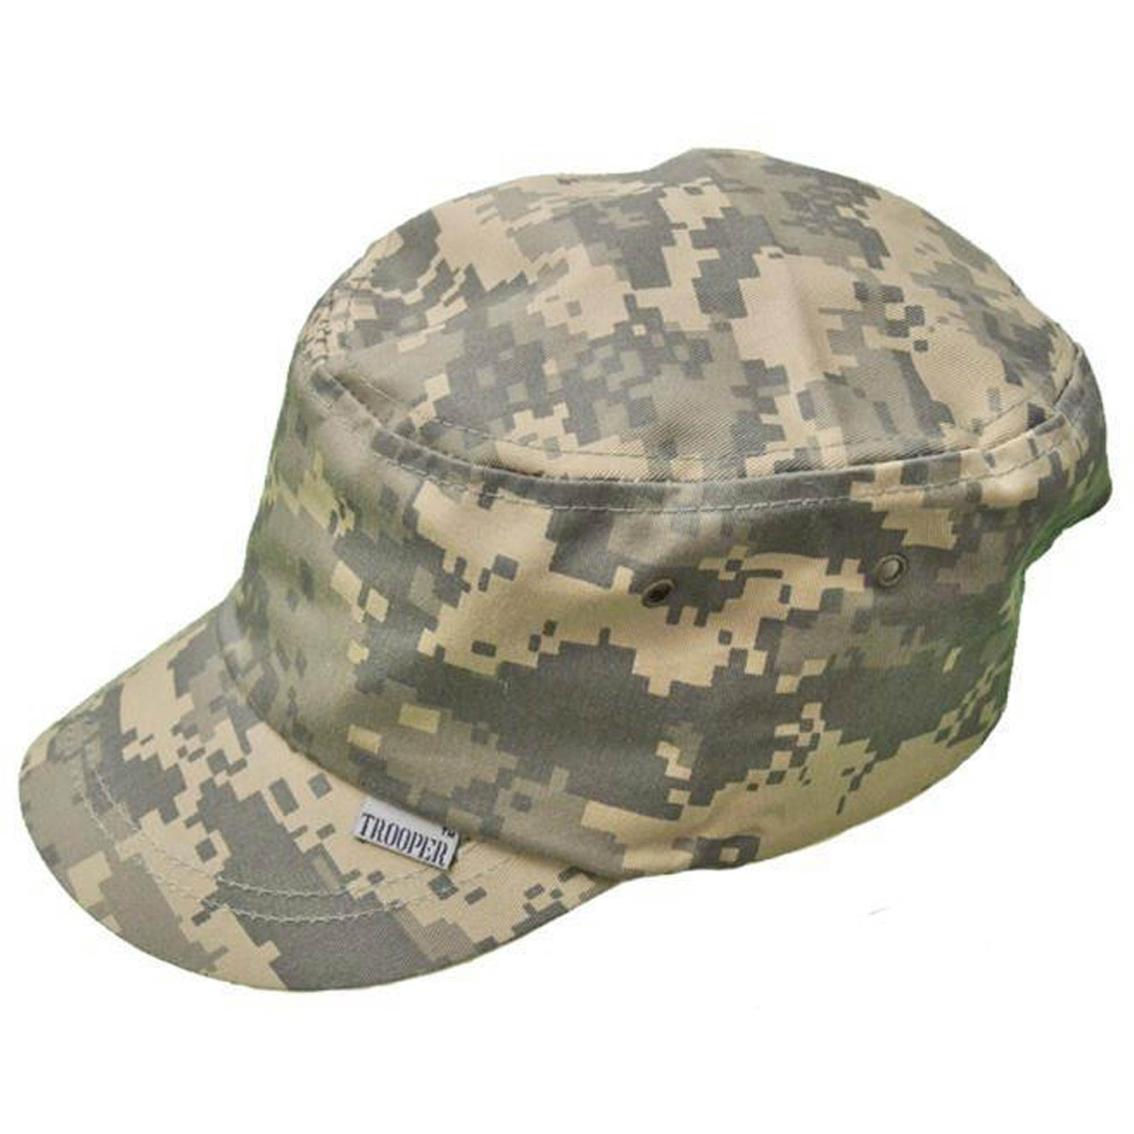 Trooper Clothing Kids Acu Camouflage Patrol Cap With Velcro Closure ... aa218254262